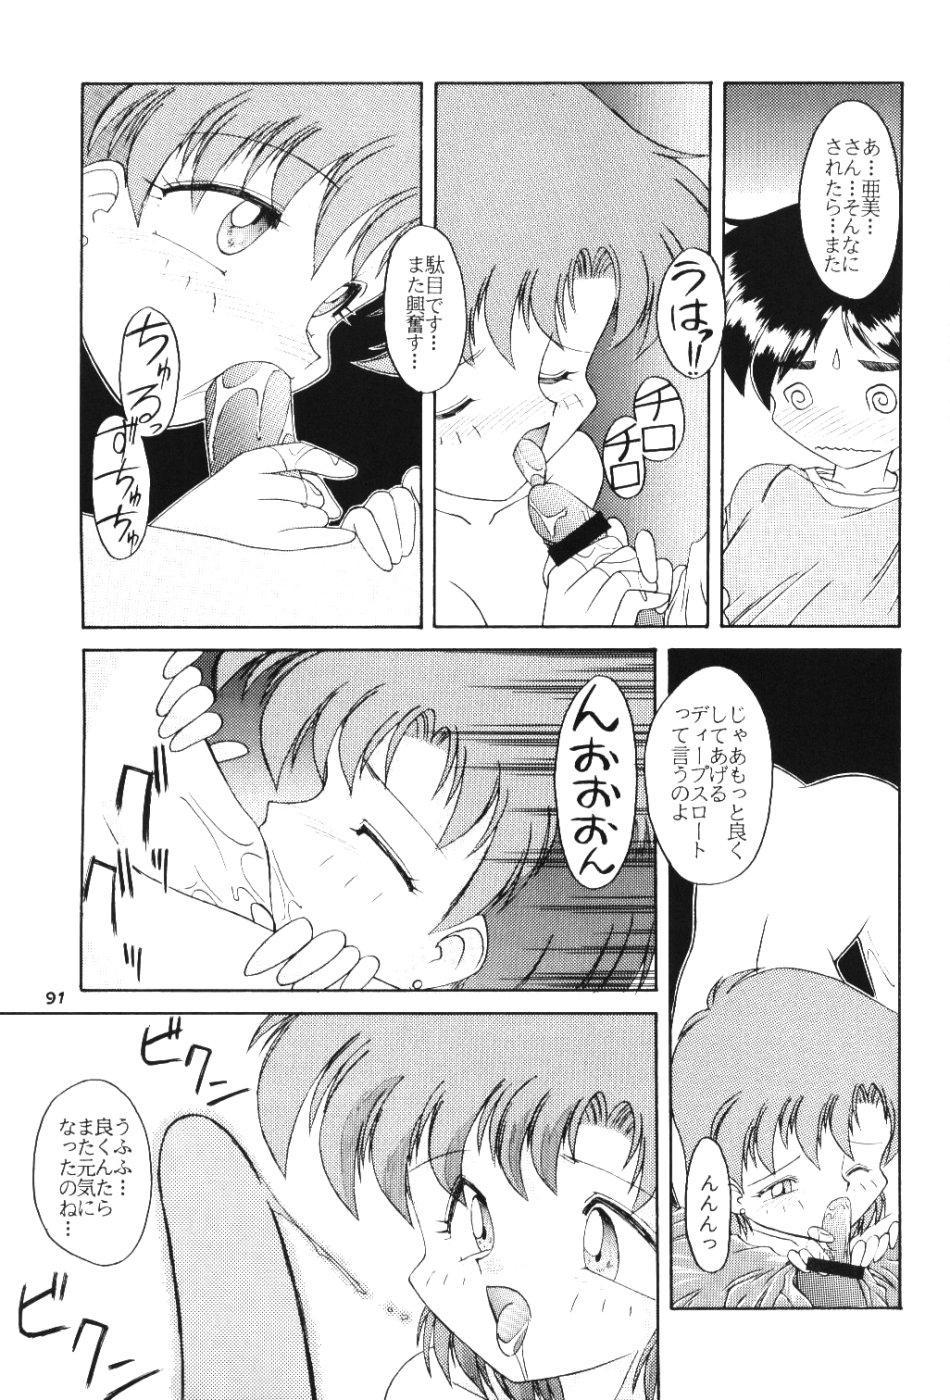 Moon Memories Vol. 2 89